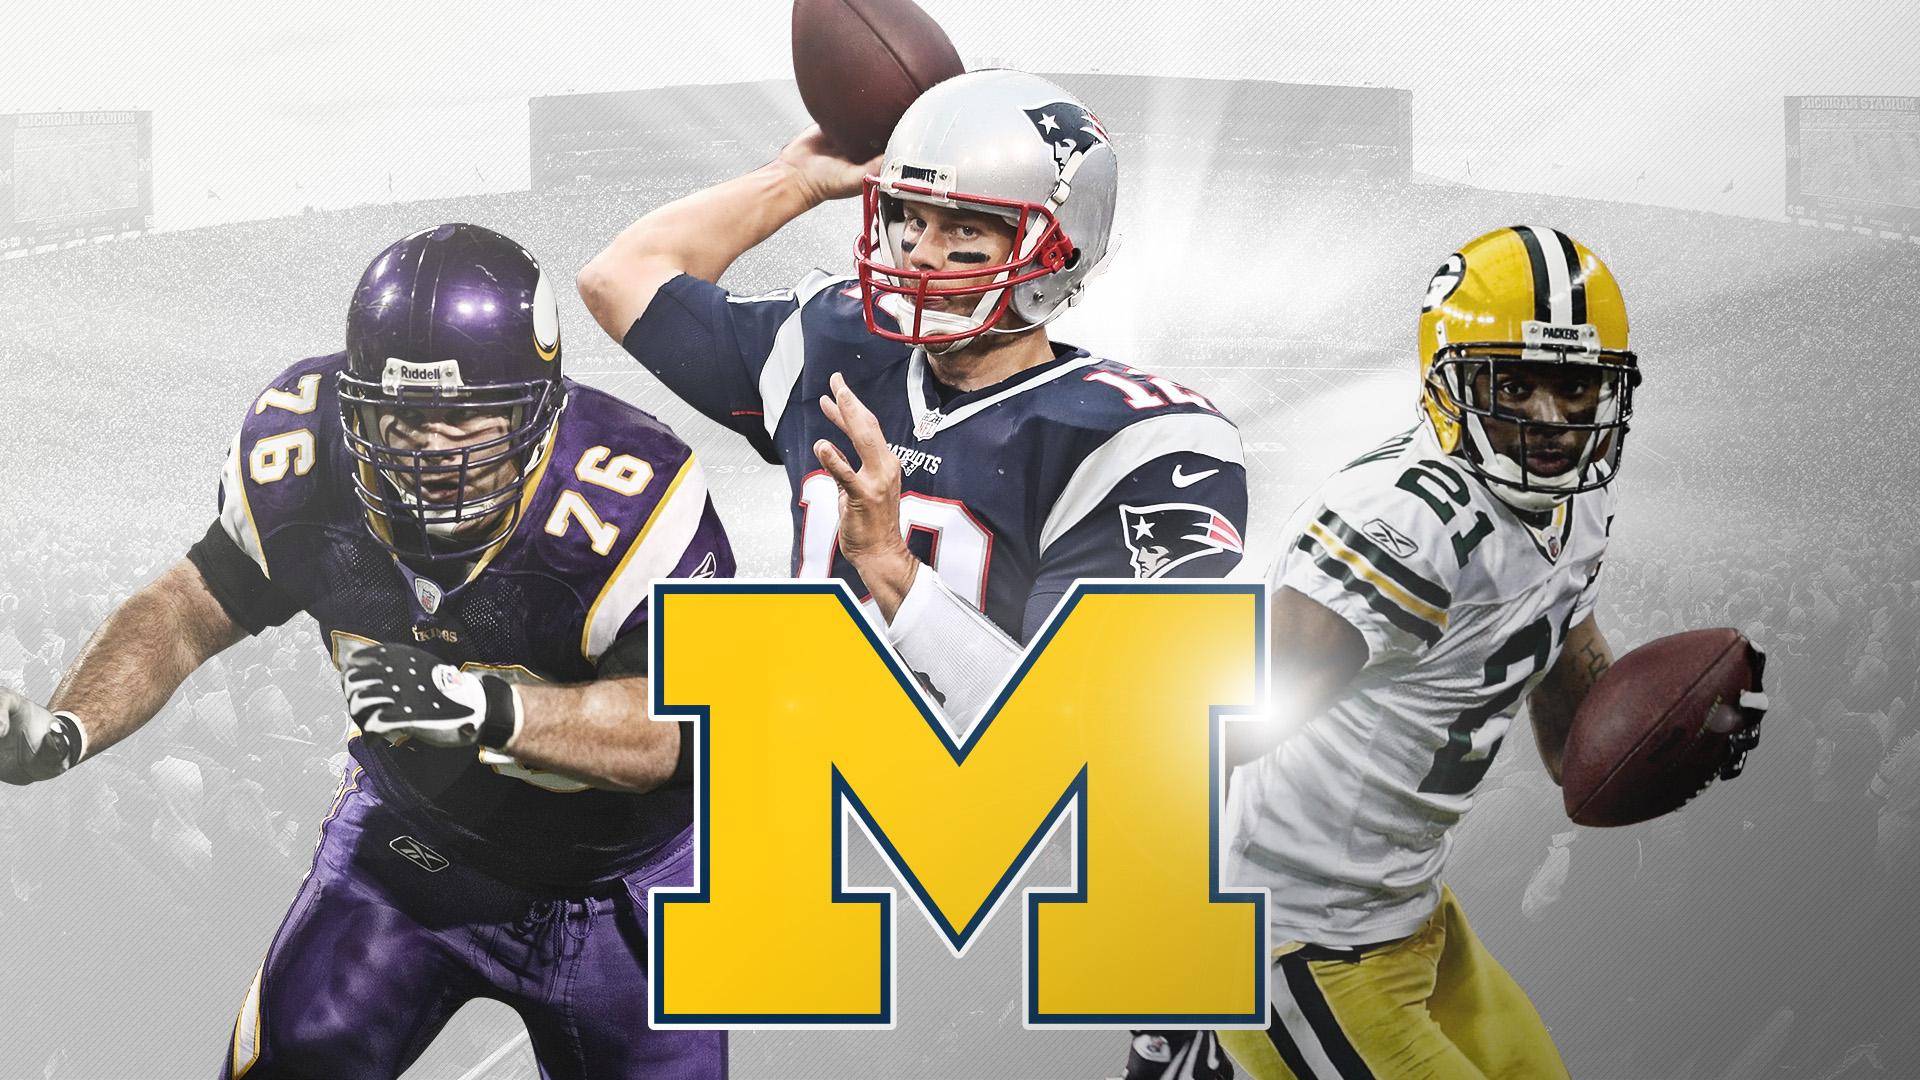 Michigan-draft-picks-rileyjpg_1snfyr1hygdqz1aikdey62bh2j